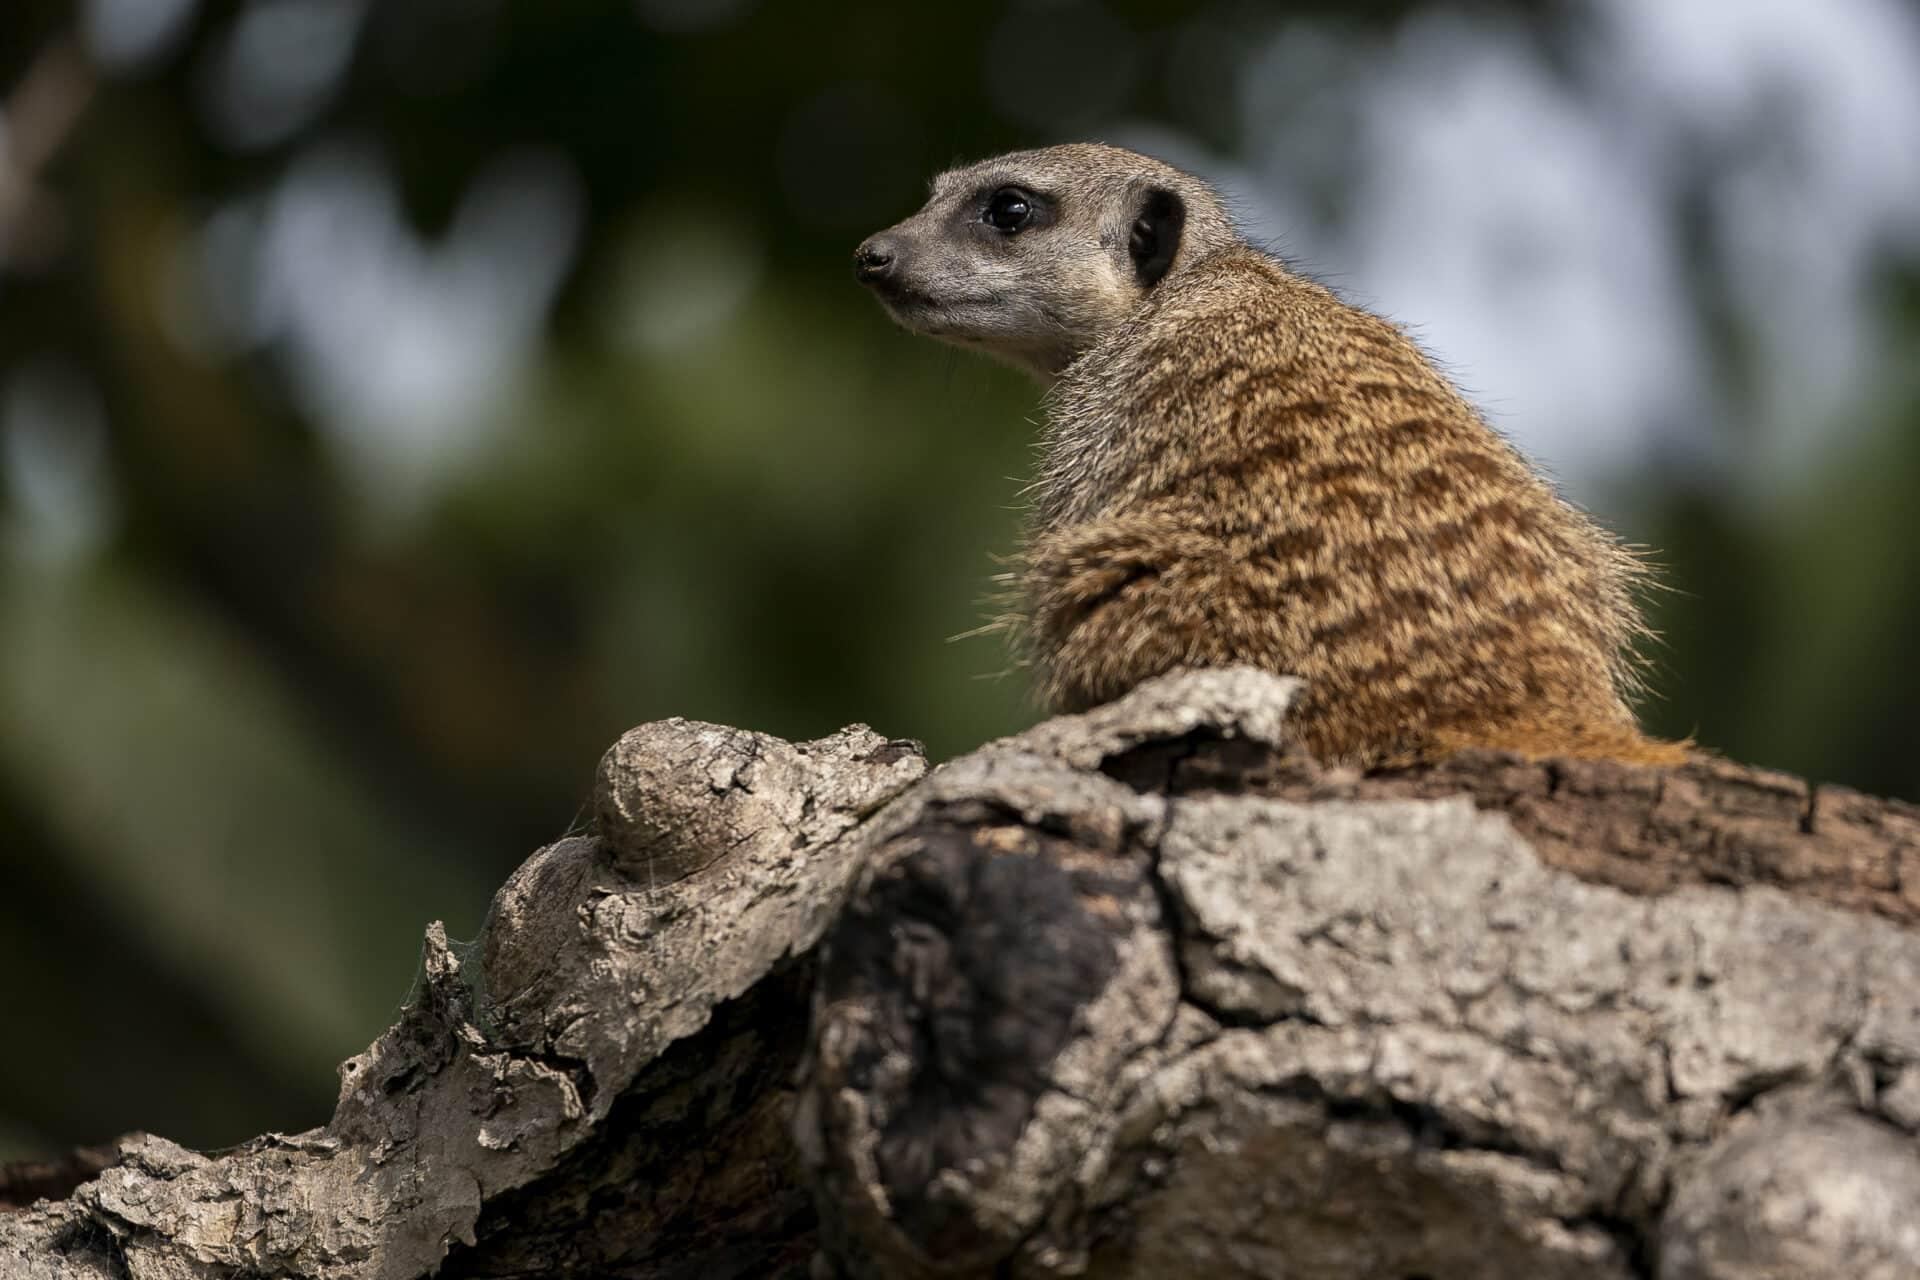 Meerkat Suricata Suricatta Marwell Zoo Jason Brown Meerkats 6